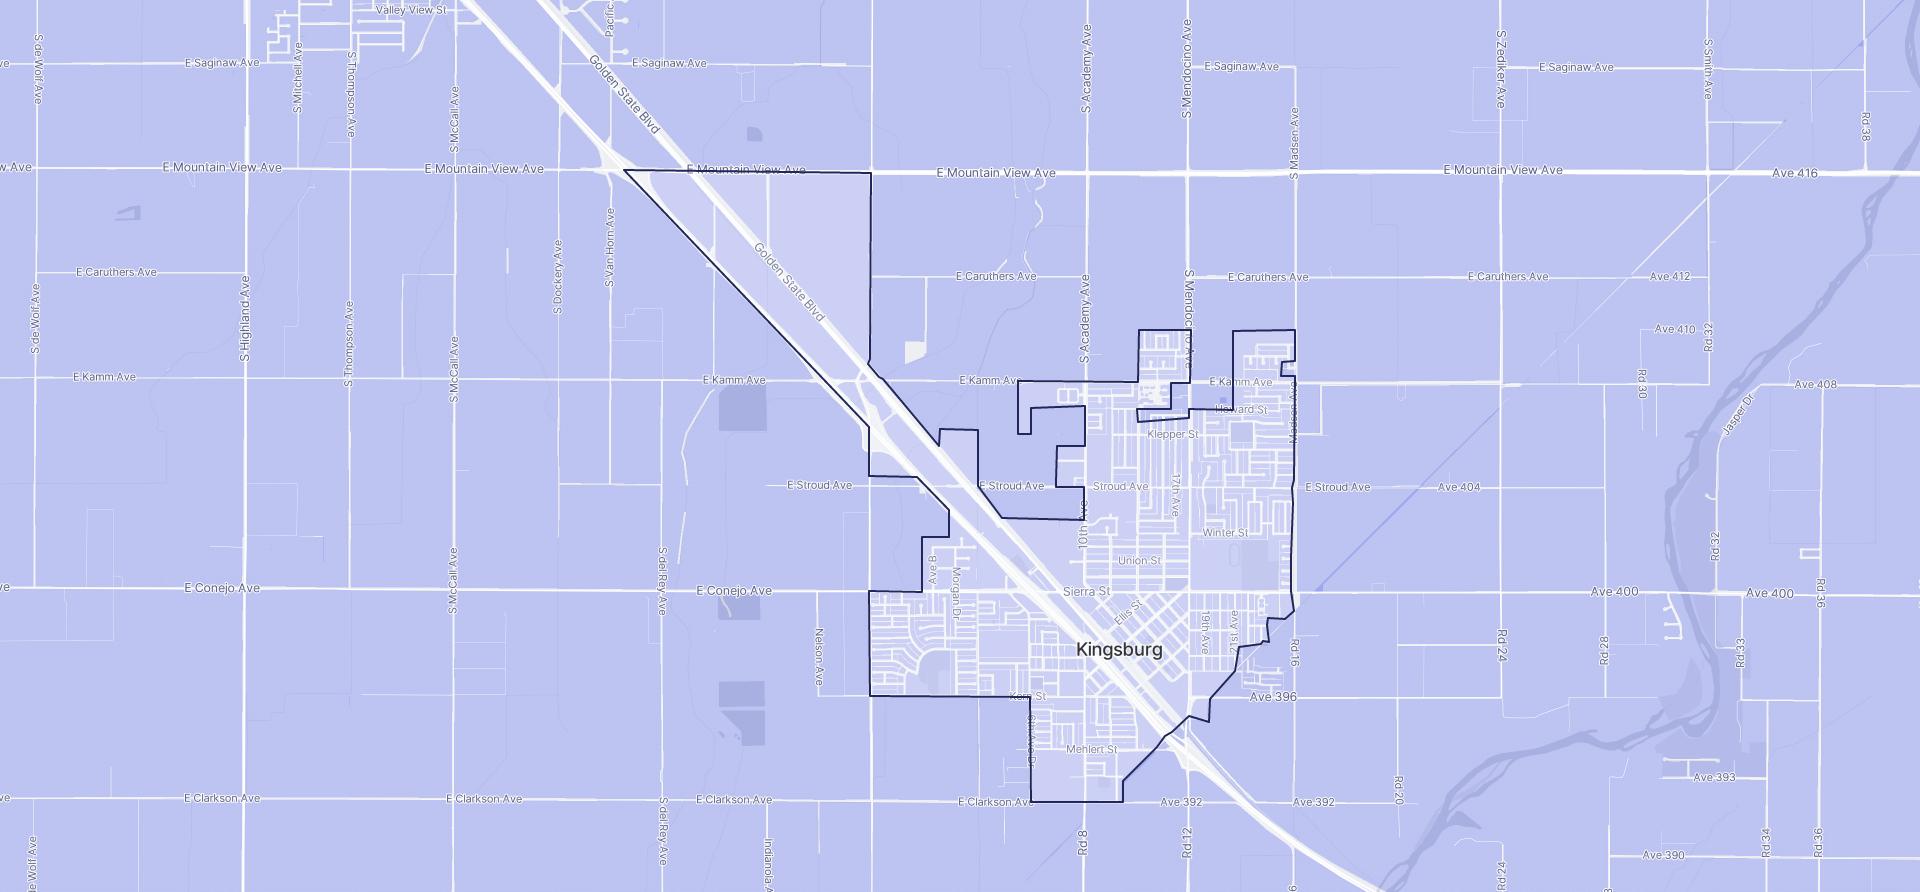 Image of Kingsburg boundaries on a map.